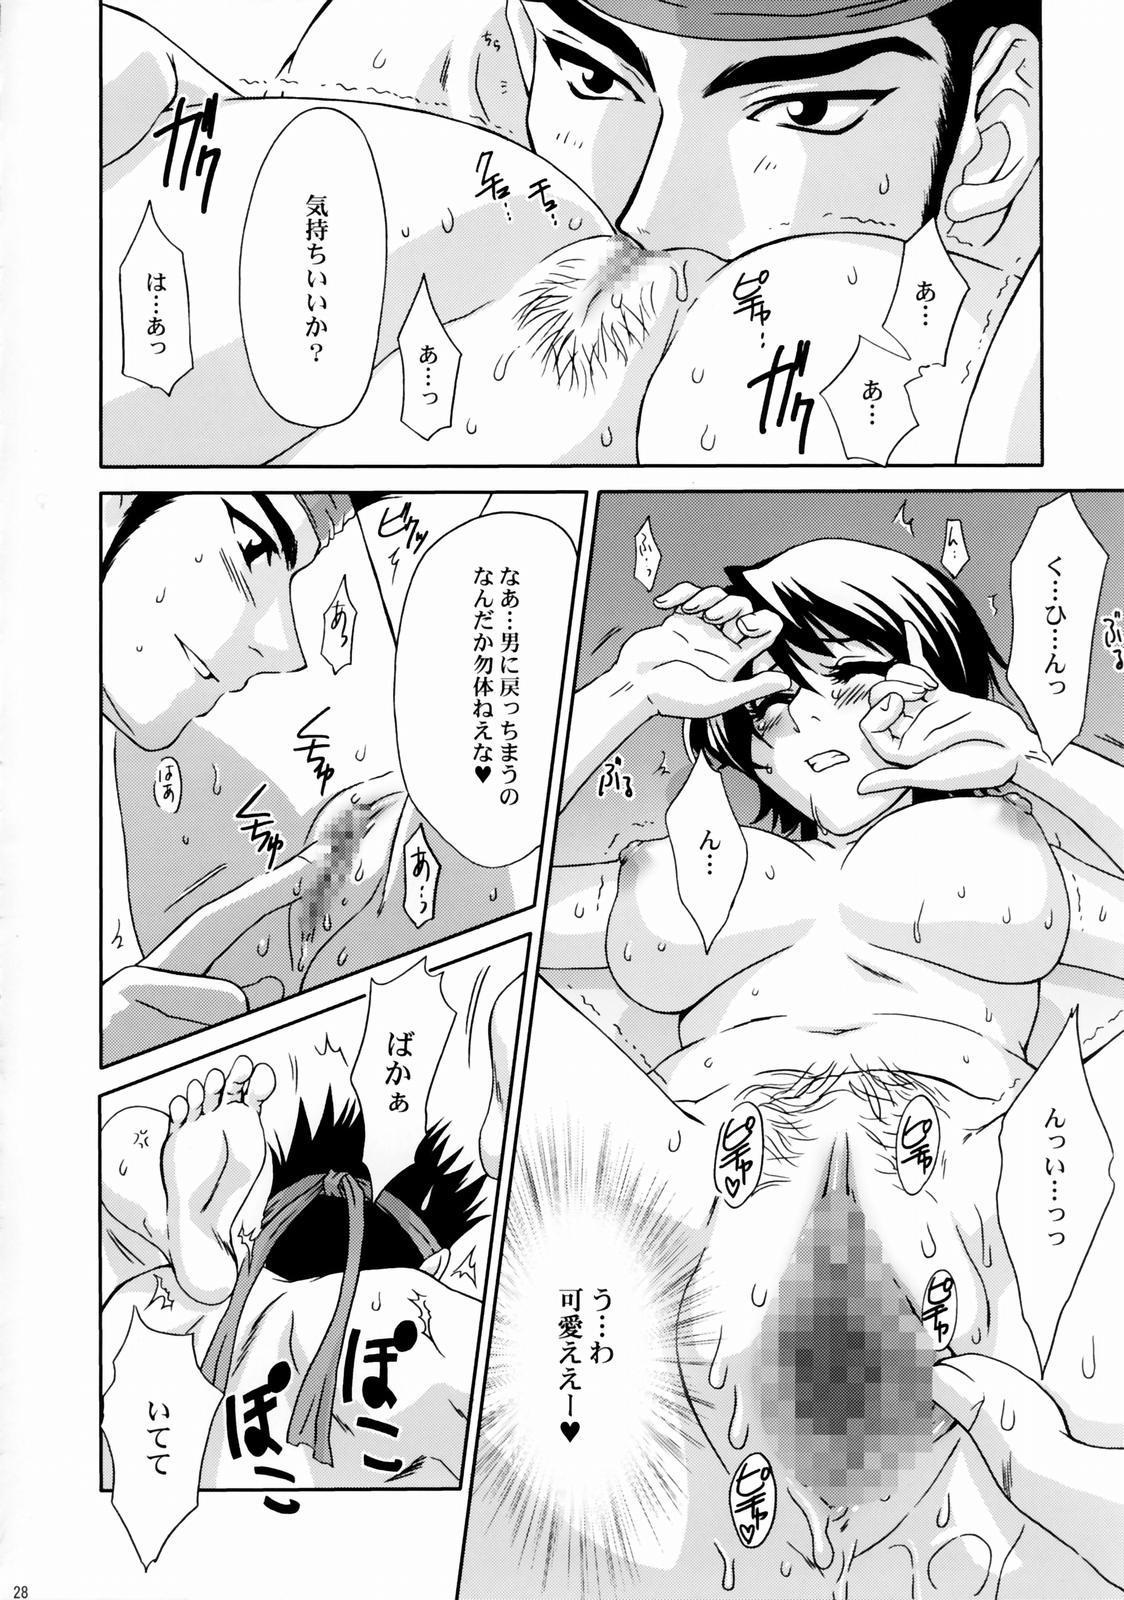 In Sangoku Musou Rikuson Gaiden 26